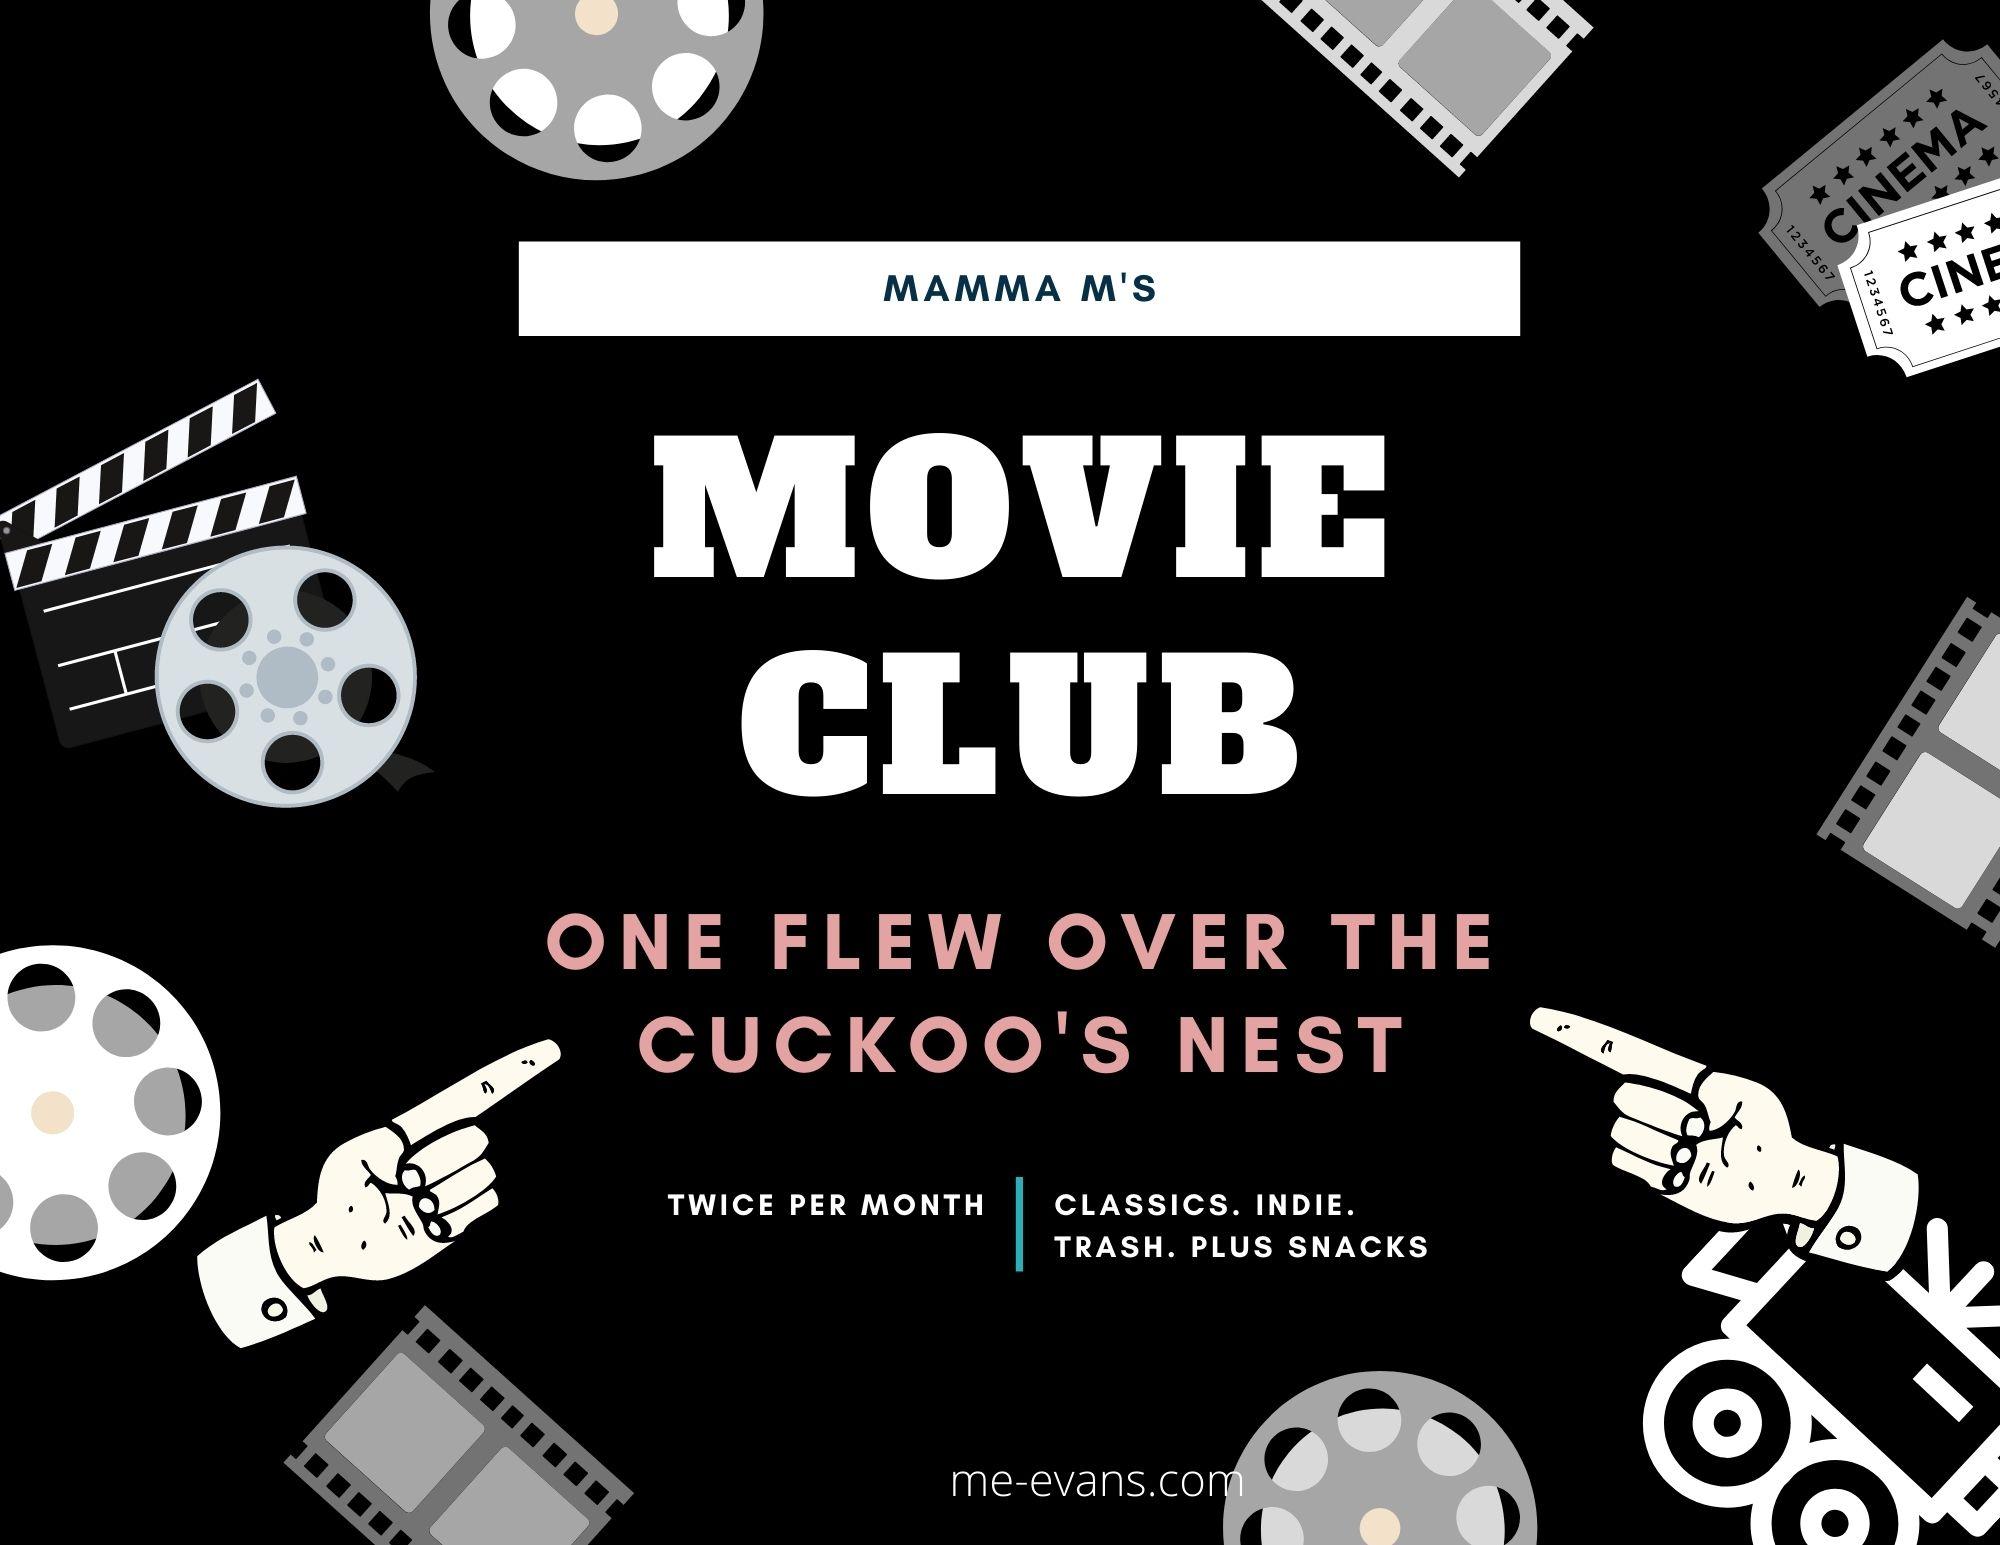 Mamma M's Movie Club: One Flew Over the Cuckoo's Nest